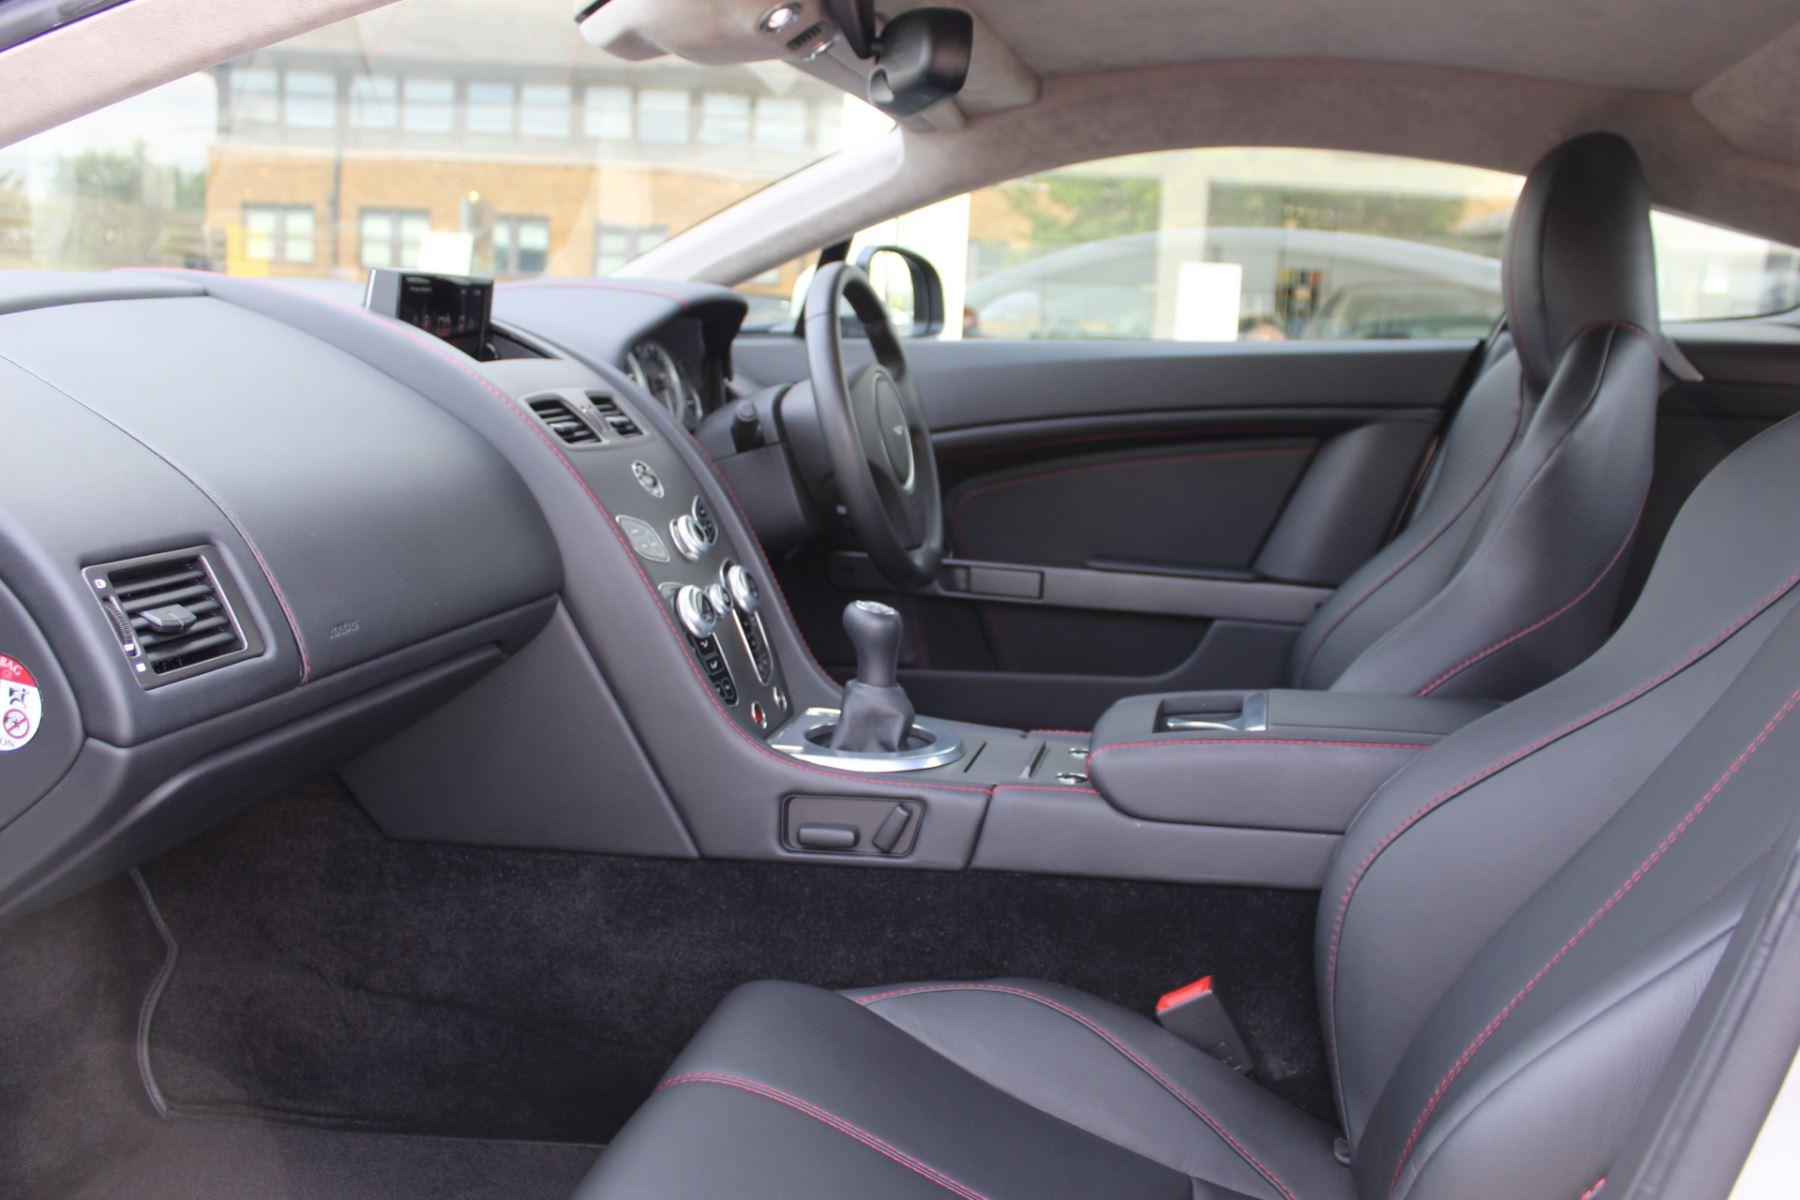 Aston Martin V8 Vantage Coupe 2dr [420] Latest Dash, 420BHP image 7